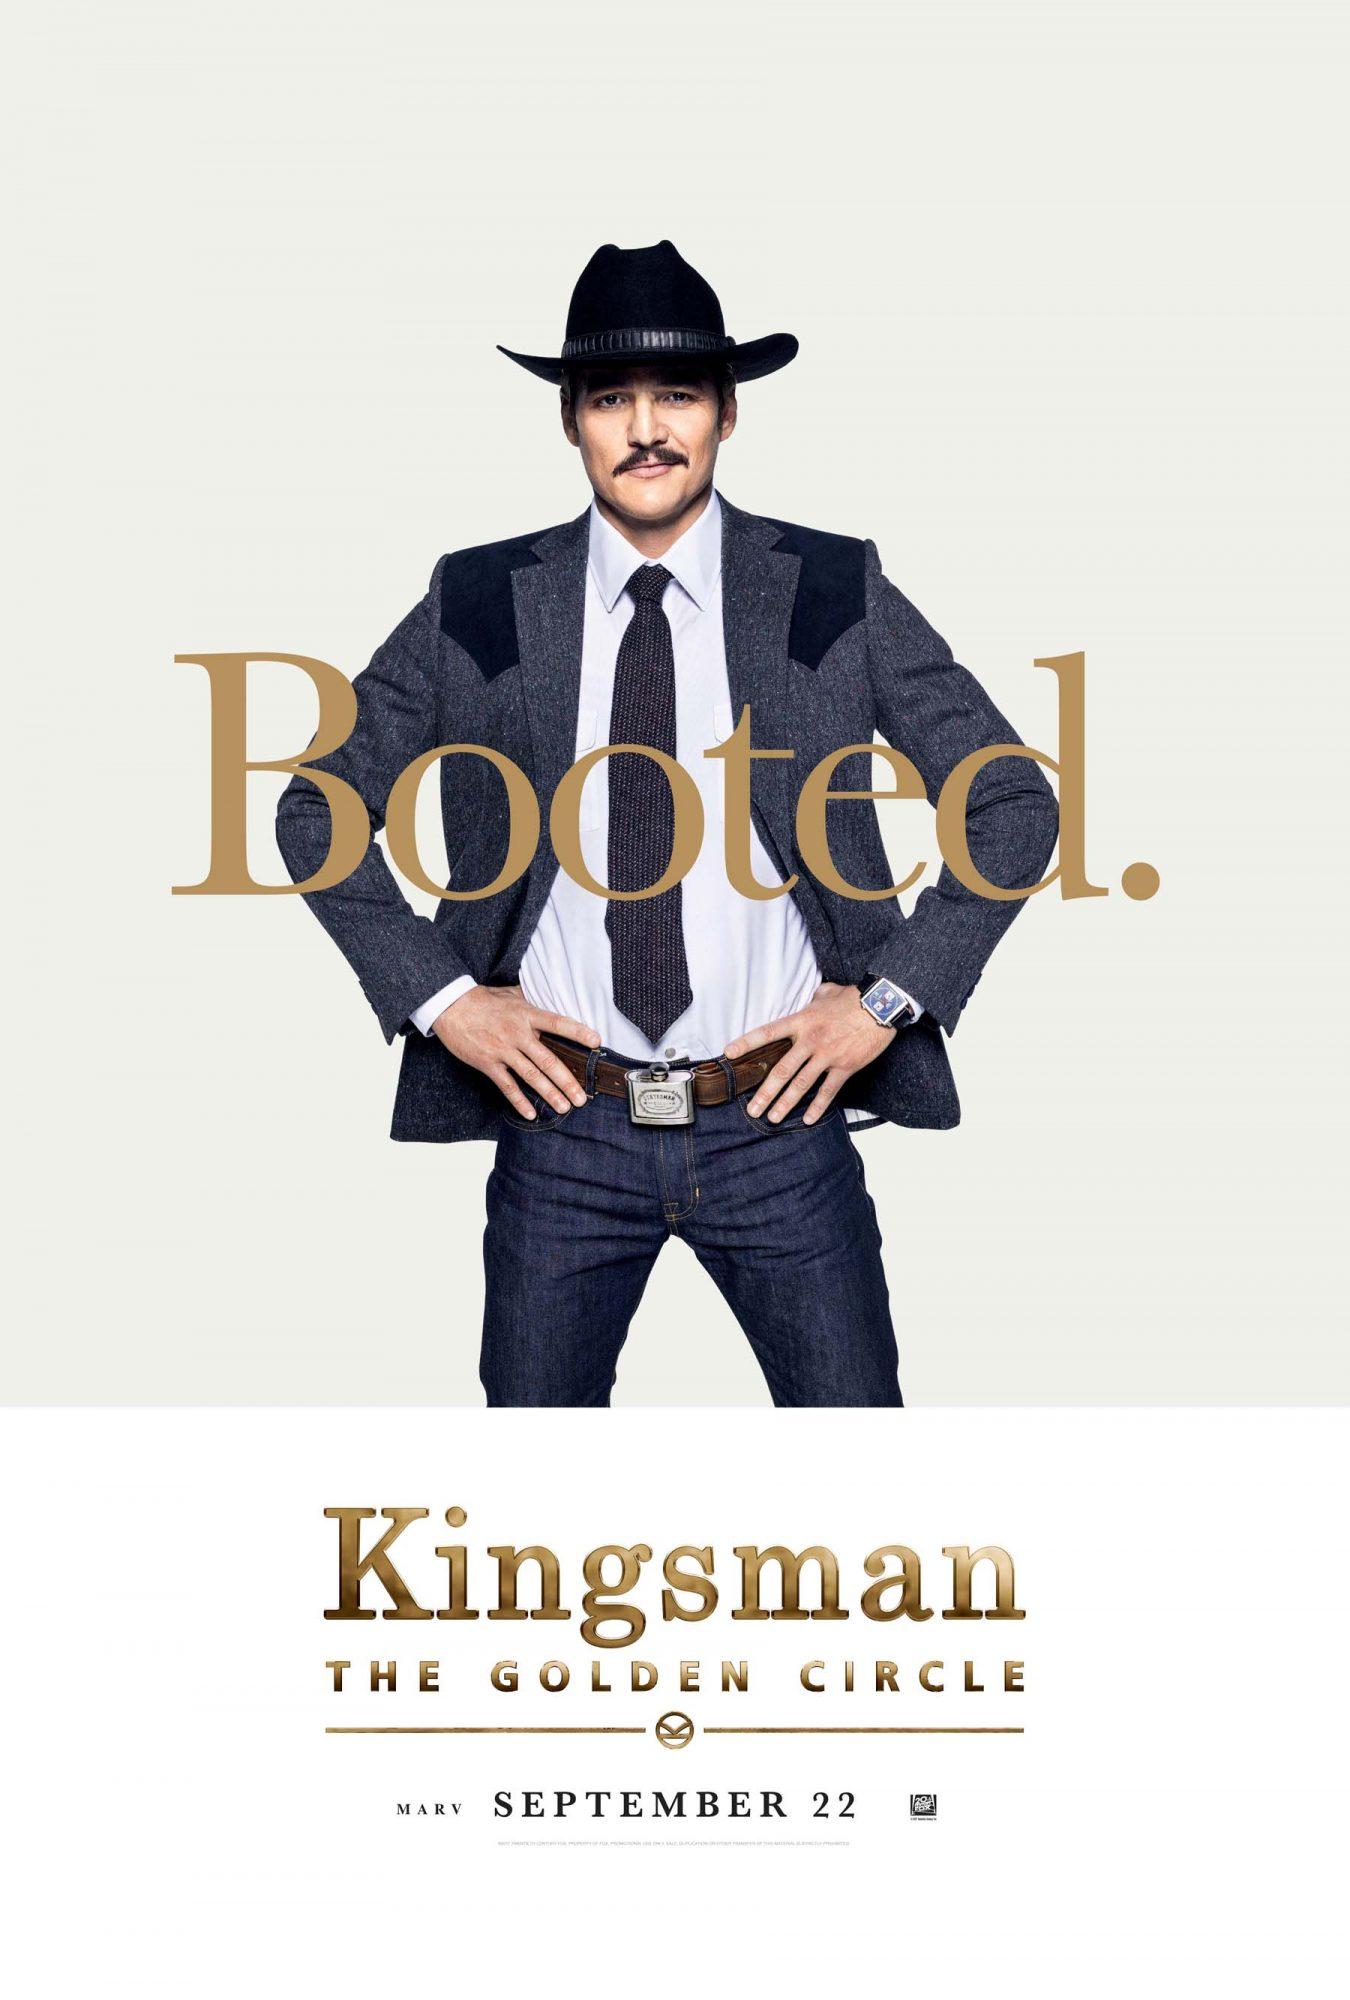 Kingsman The Golden Circle Character Poster